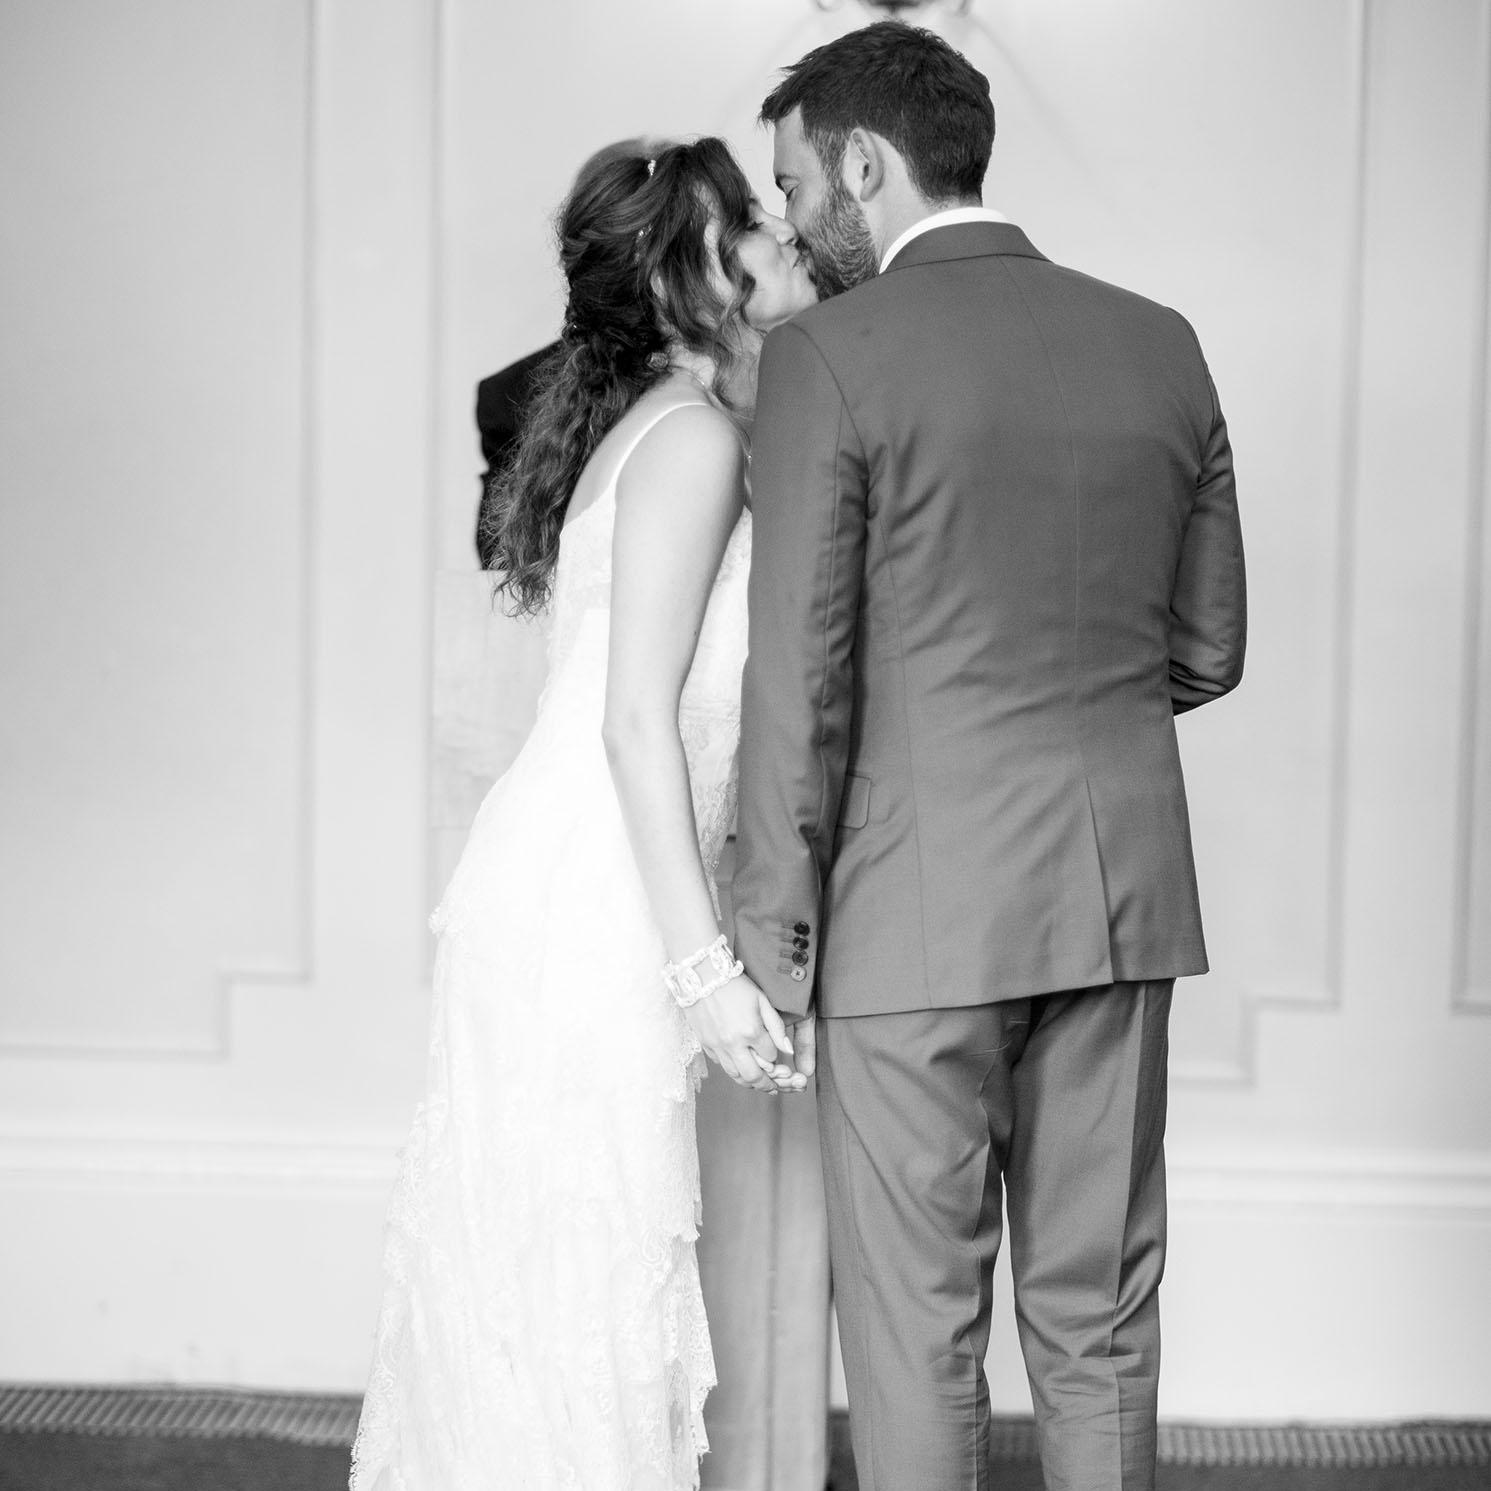 elizabethgphotography_kingslangley_hertfordshire_fineart_wedding_enfield_ricky_nicole_nahlis_20.jpg